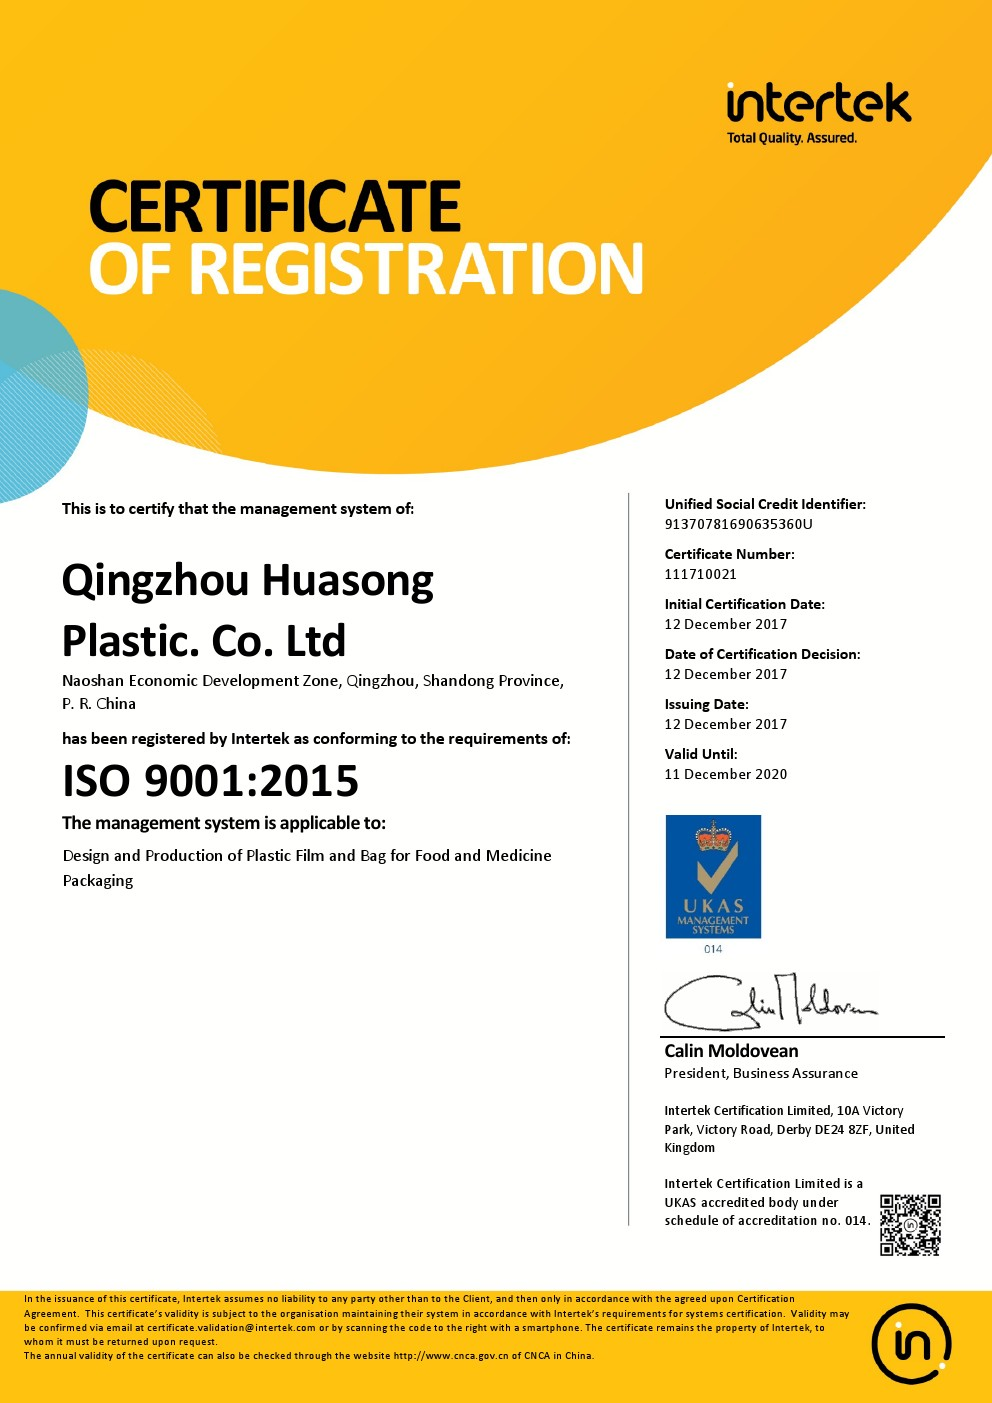 9001 management system certification 2